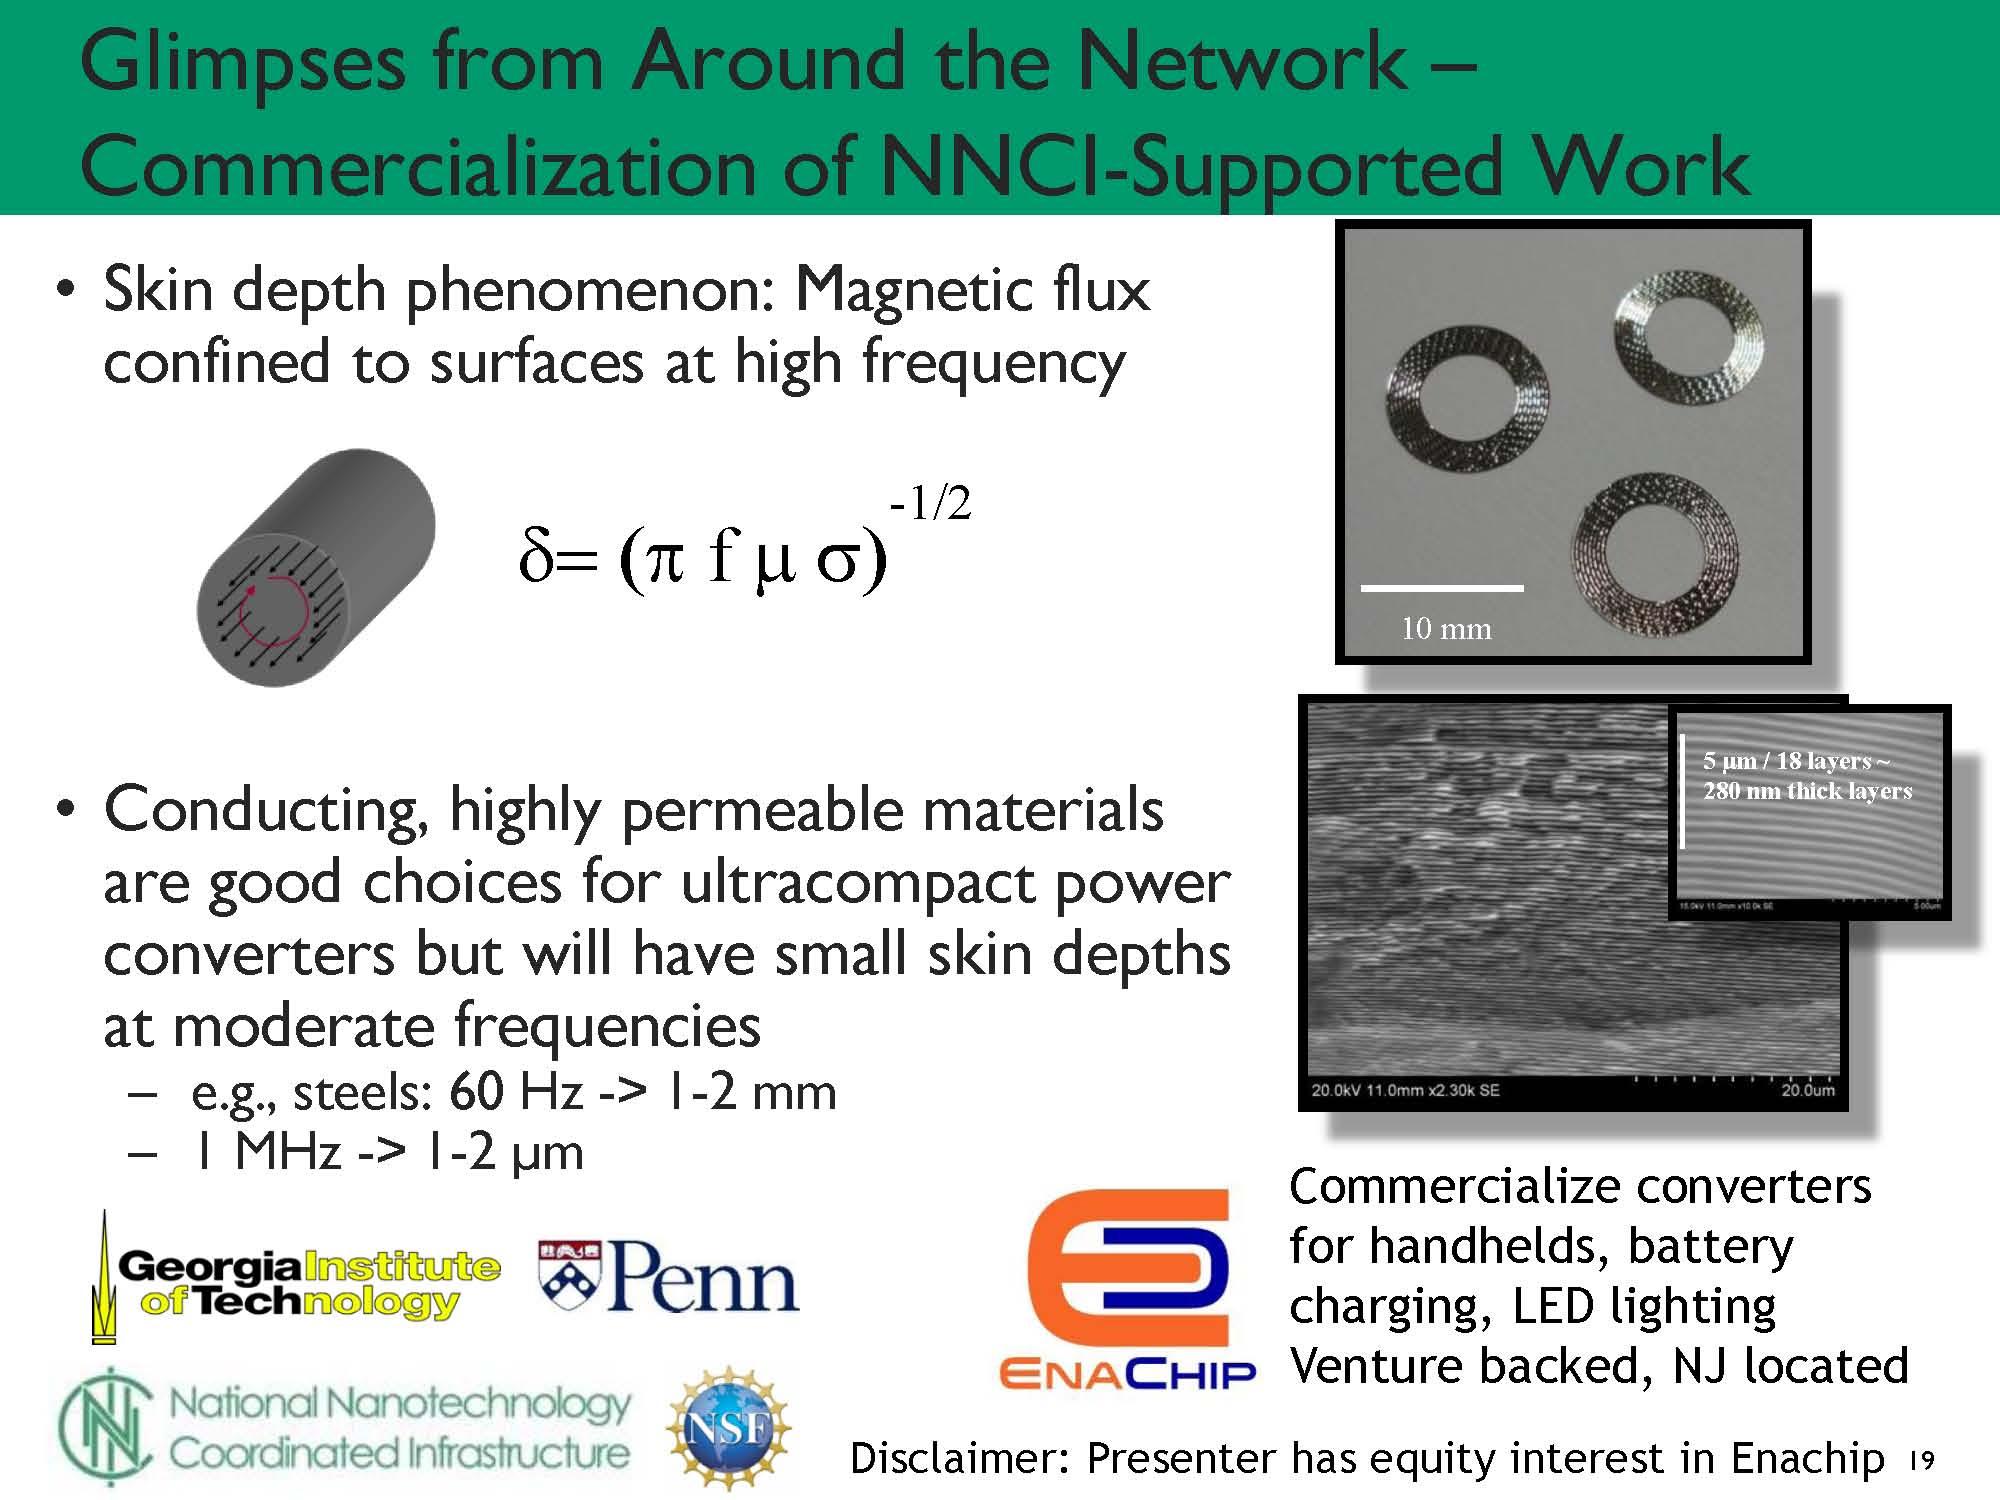 NSF 2017 NanoscienceGrantees Conf - NNCI presentation by Mark Allen_Page_19.jpg